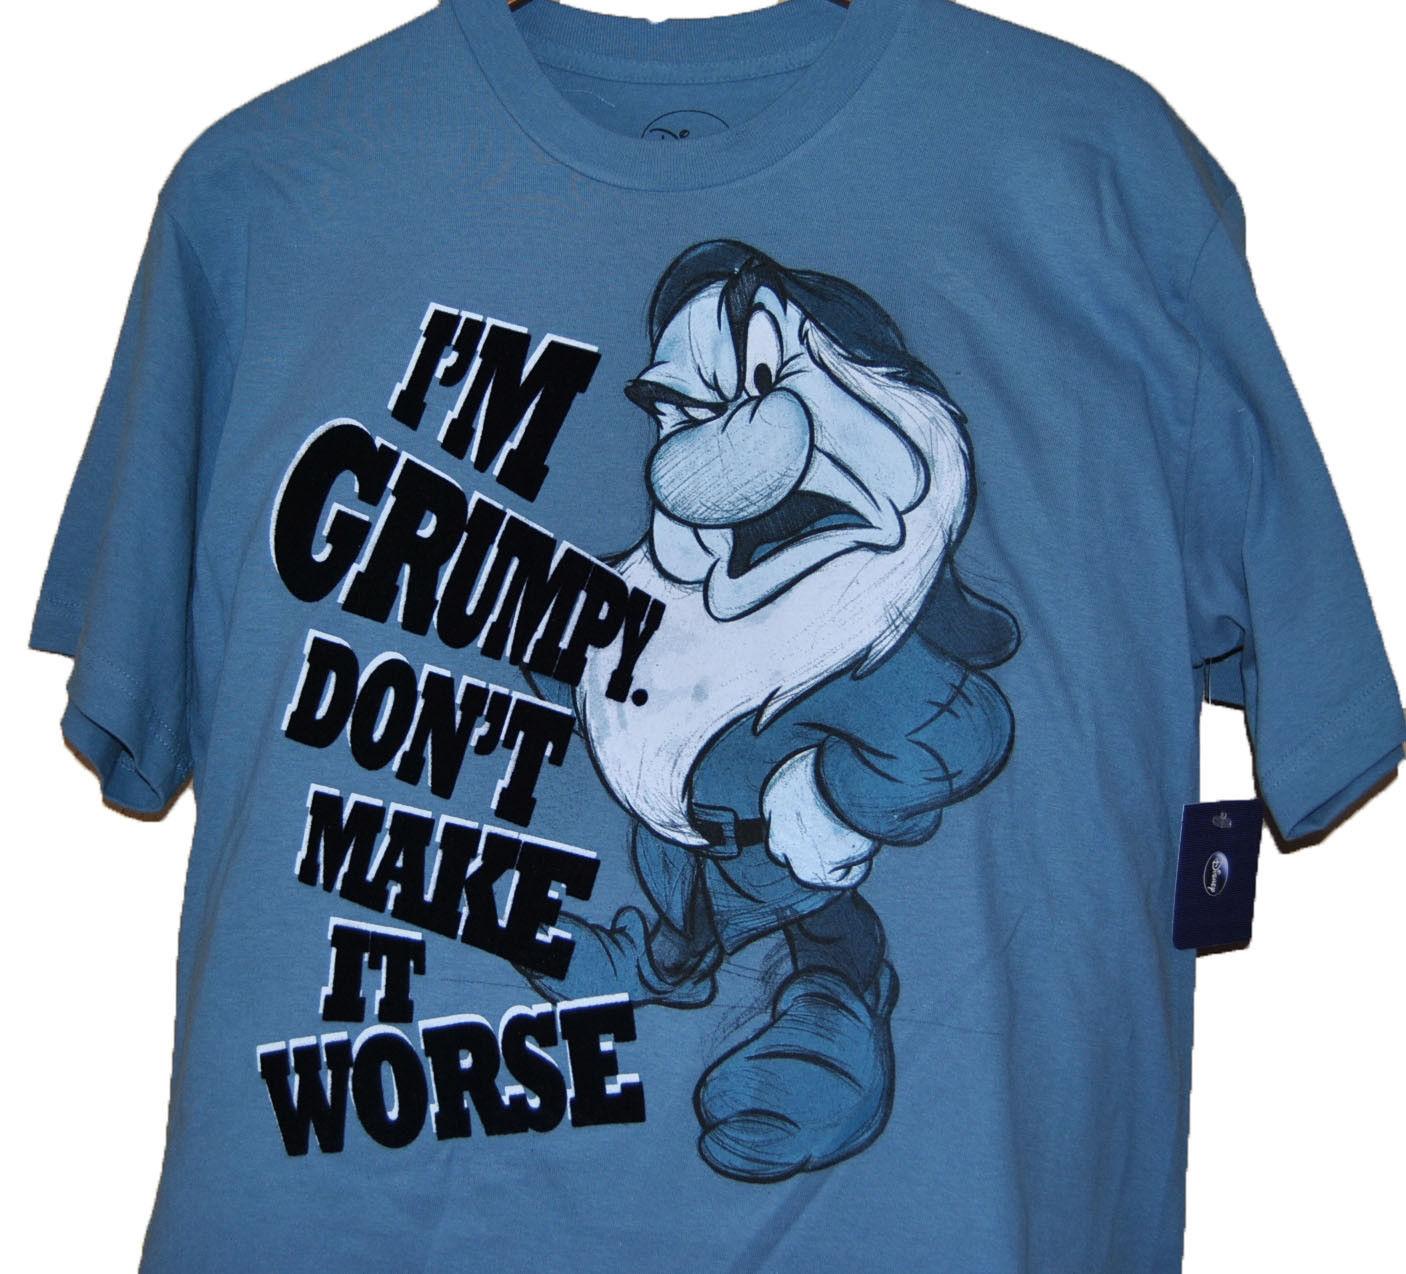 1 grumpy shirt